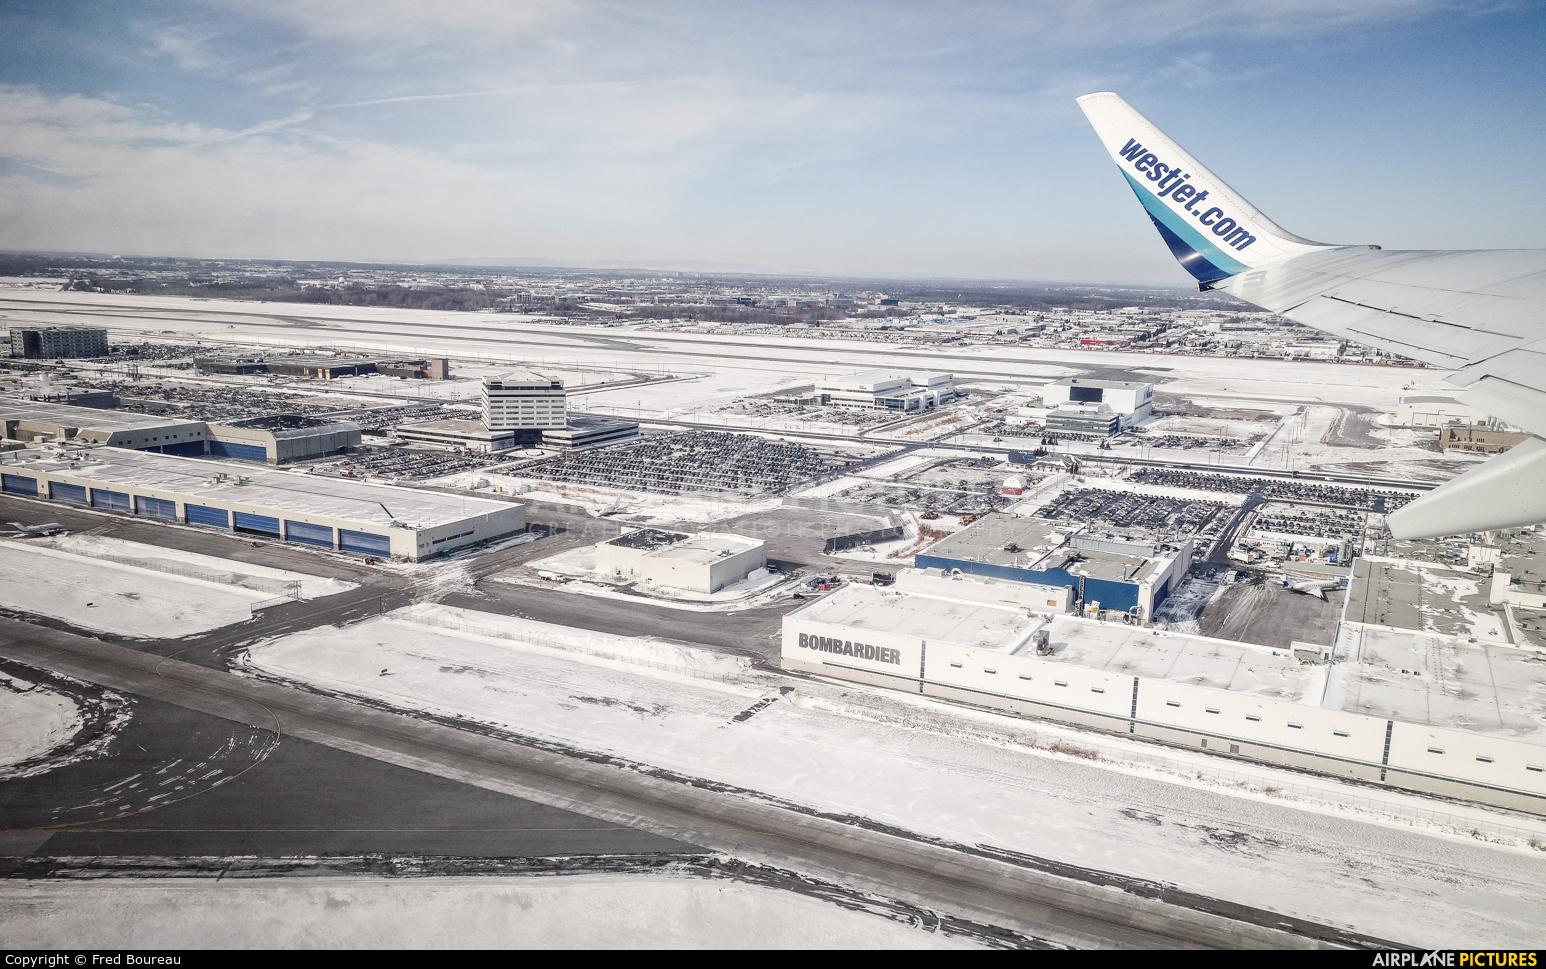 WestJet Airlines C-FKWS aircraft at Montreal - Pierre Elliott Trudeau Intl, QC